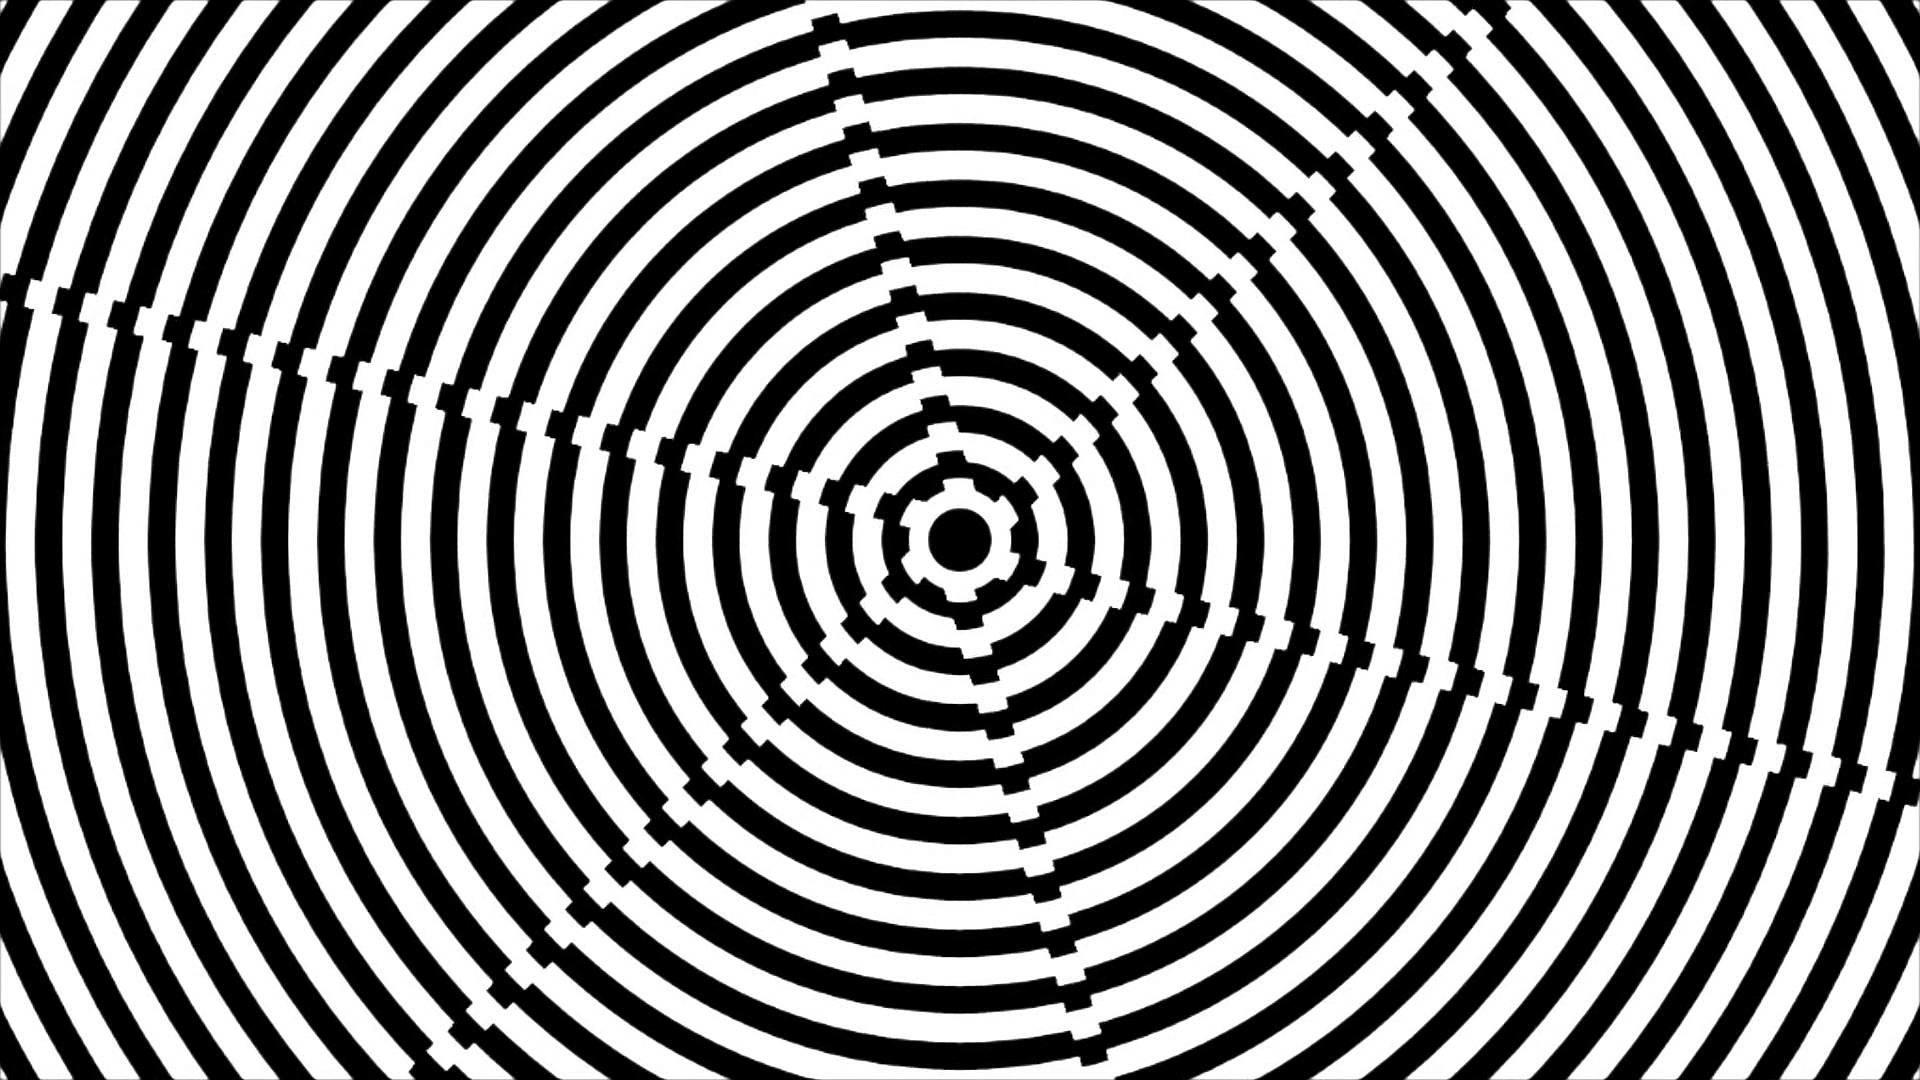 black and white Awesome Hypnosis Self Hypnotic Trance Hypnotism  Trancendental Meditation Technique